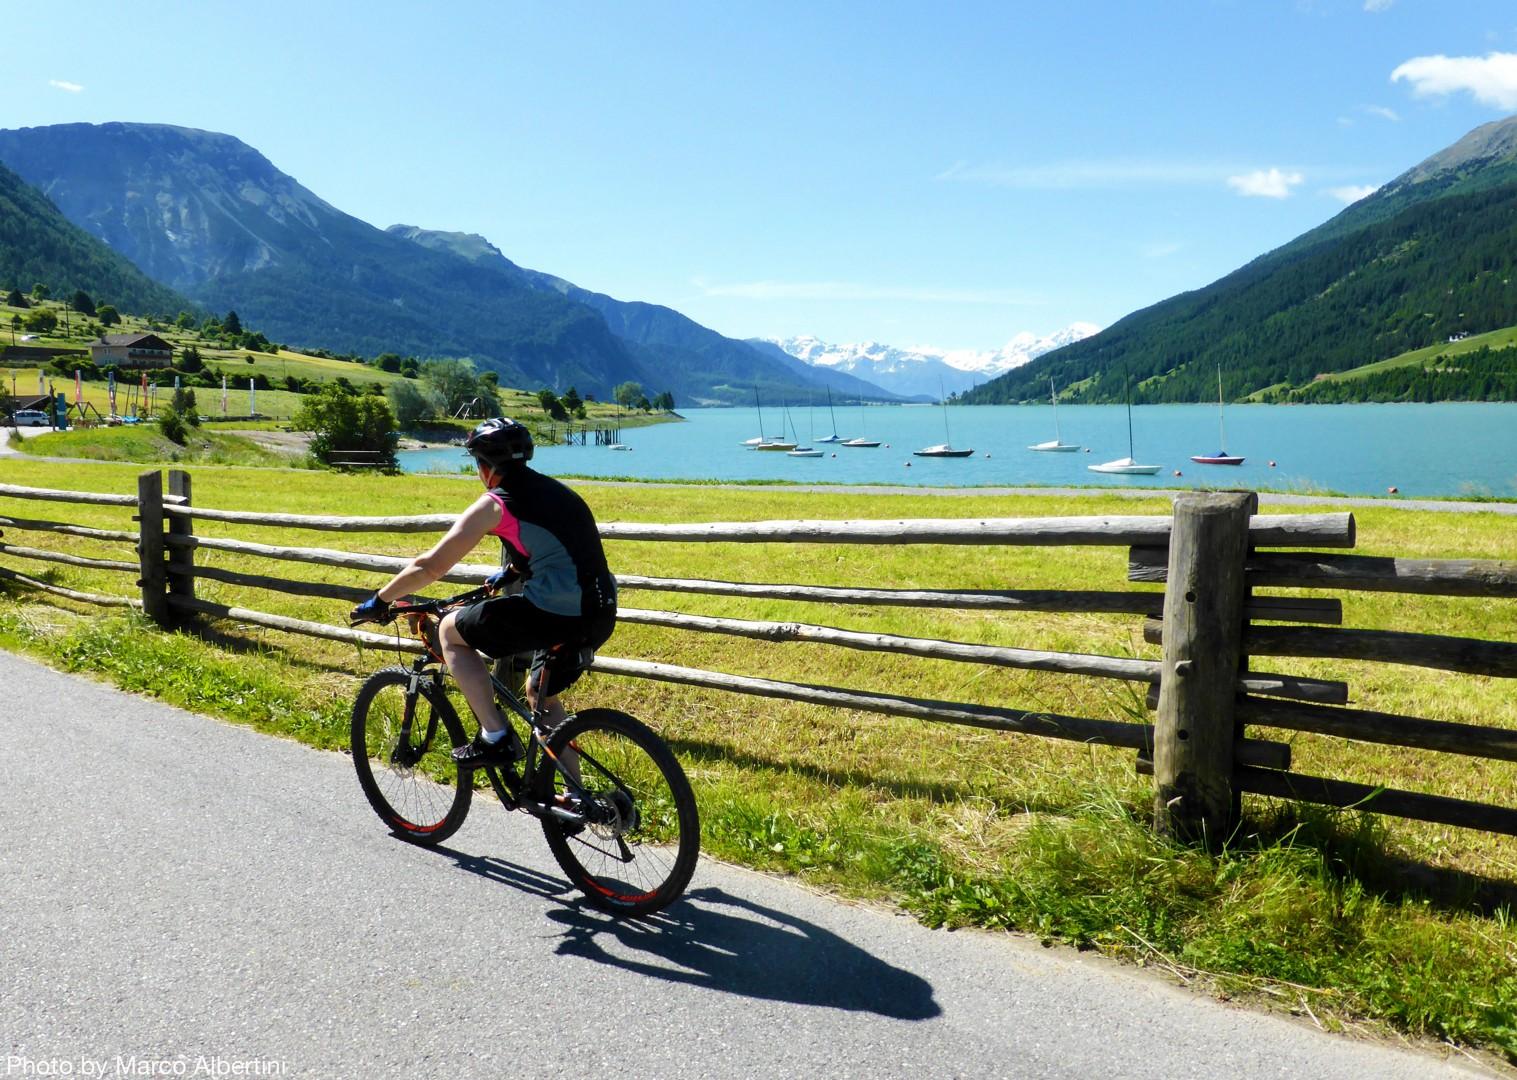 self-guided-cycling-adventure-la-via-claudia.jpg - Italy - La Via Claudia - Self-Guided Leisure Cycling Holiday - Leisure Cycling